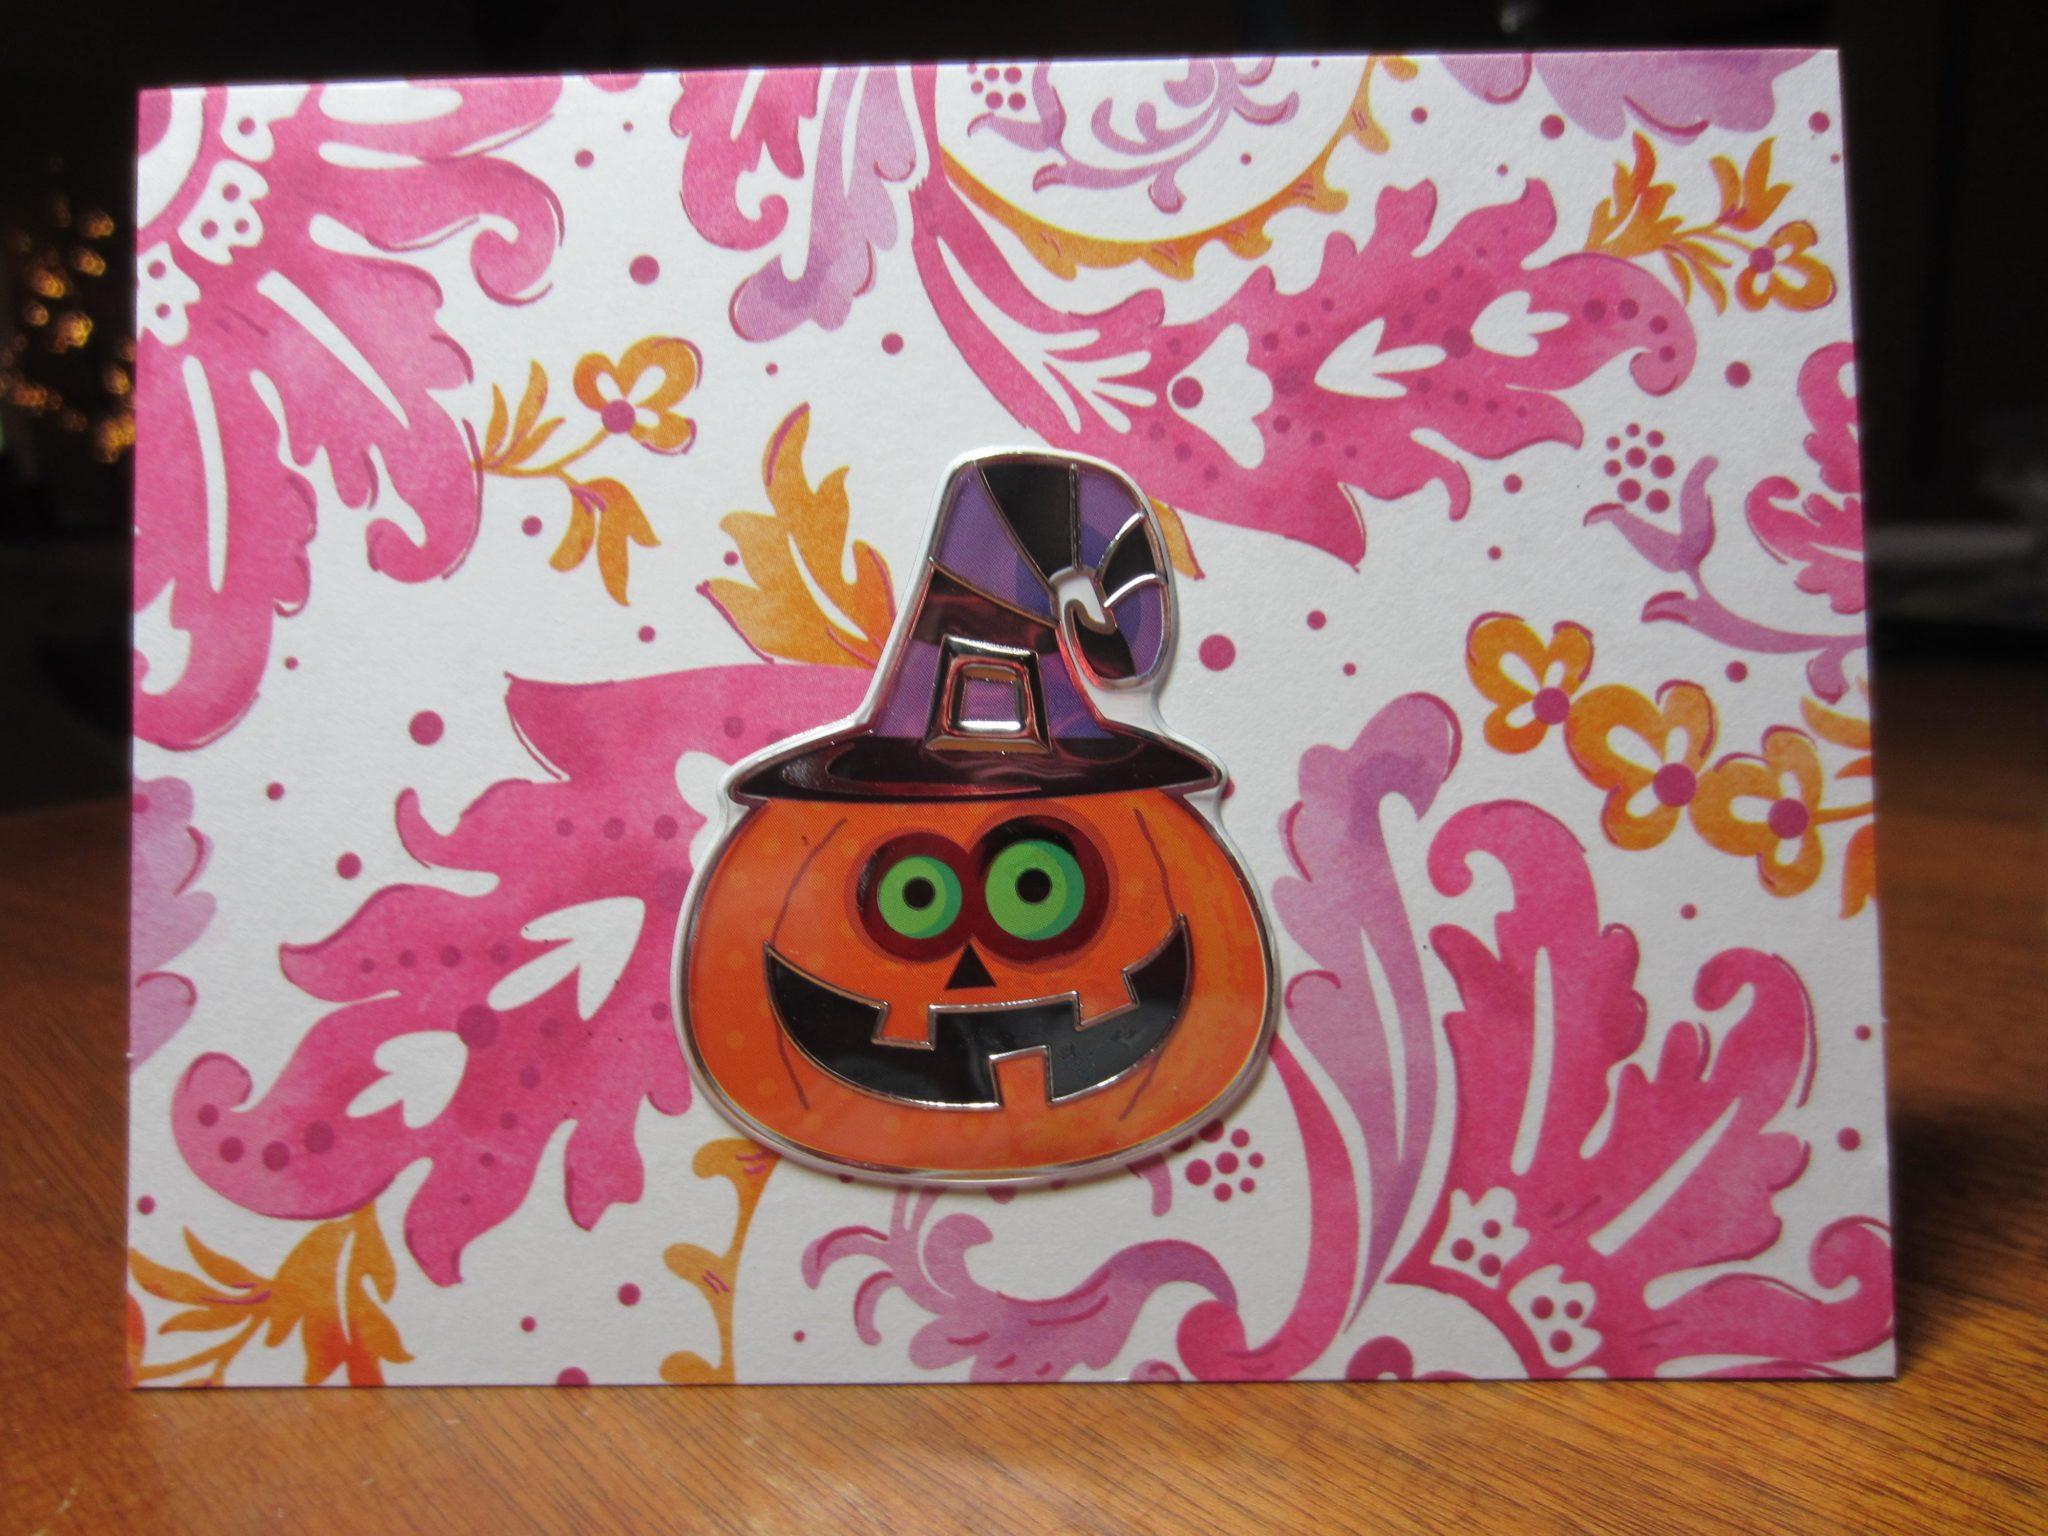 Happy pumpkin Halloween card, with a silly jack-o-lantern sticker!